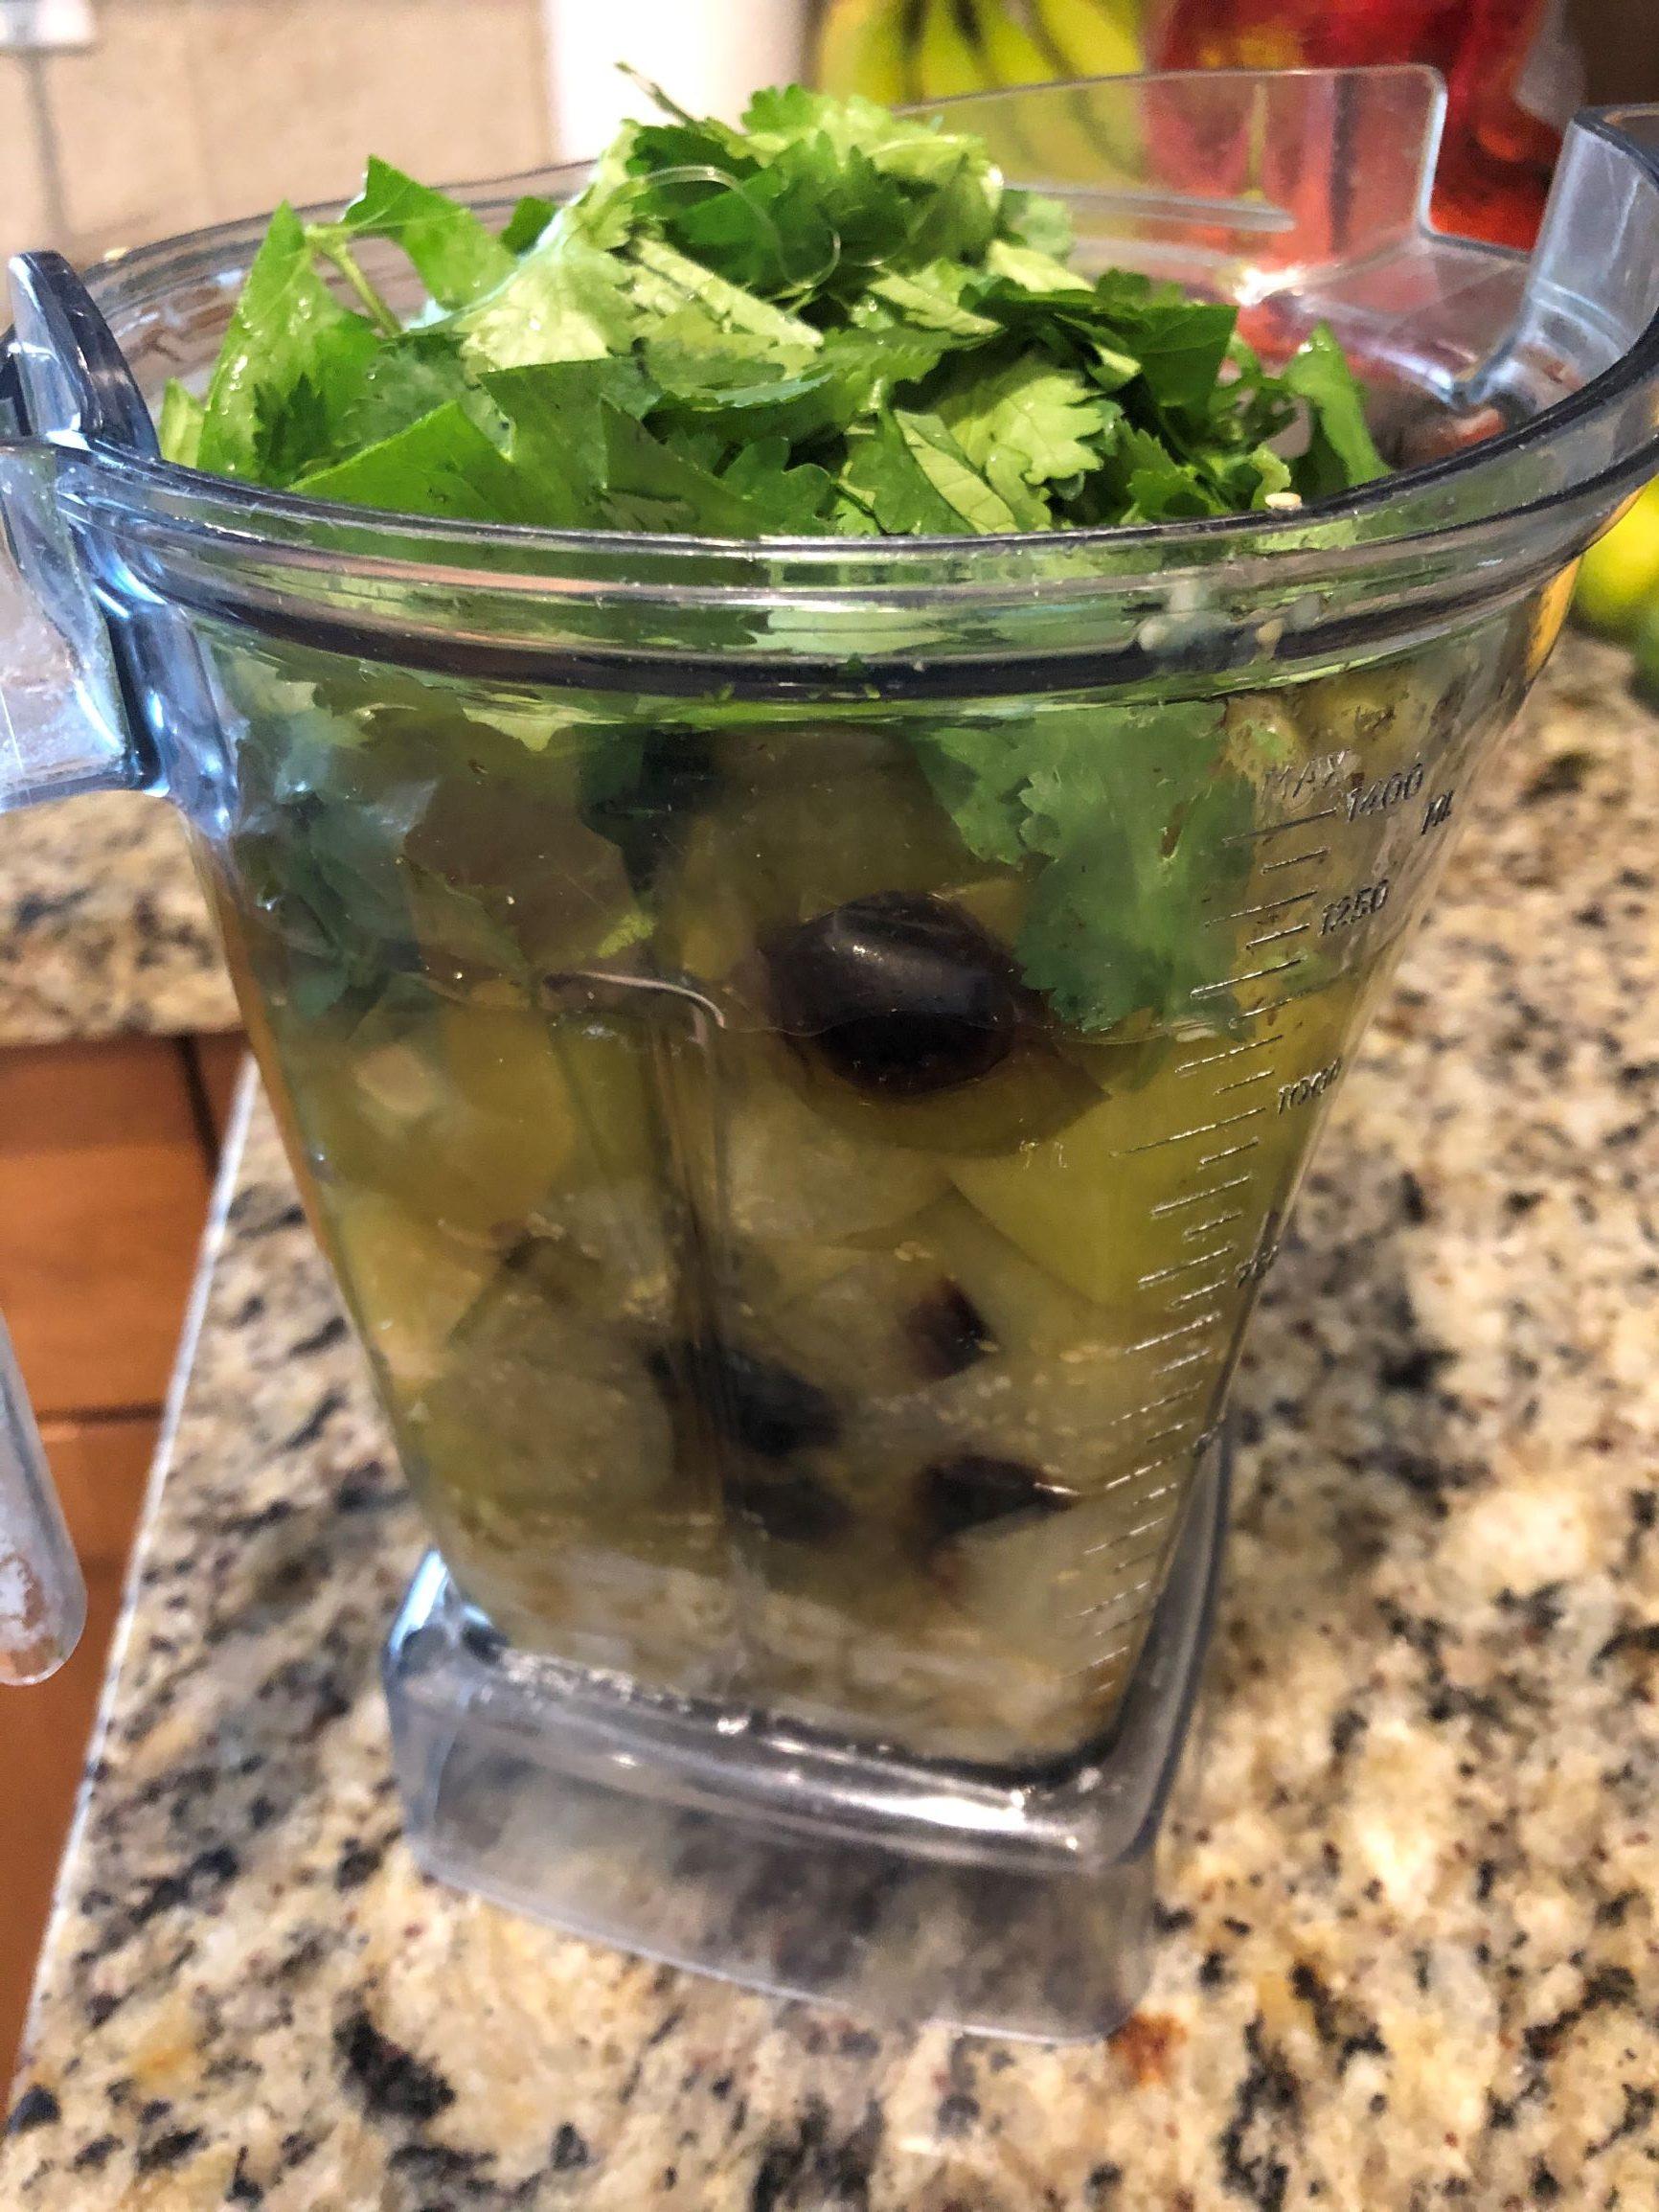 Salsa verde components ready for blending